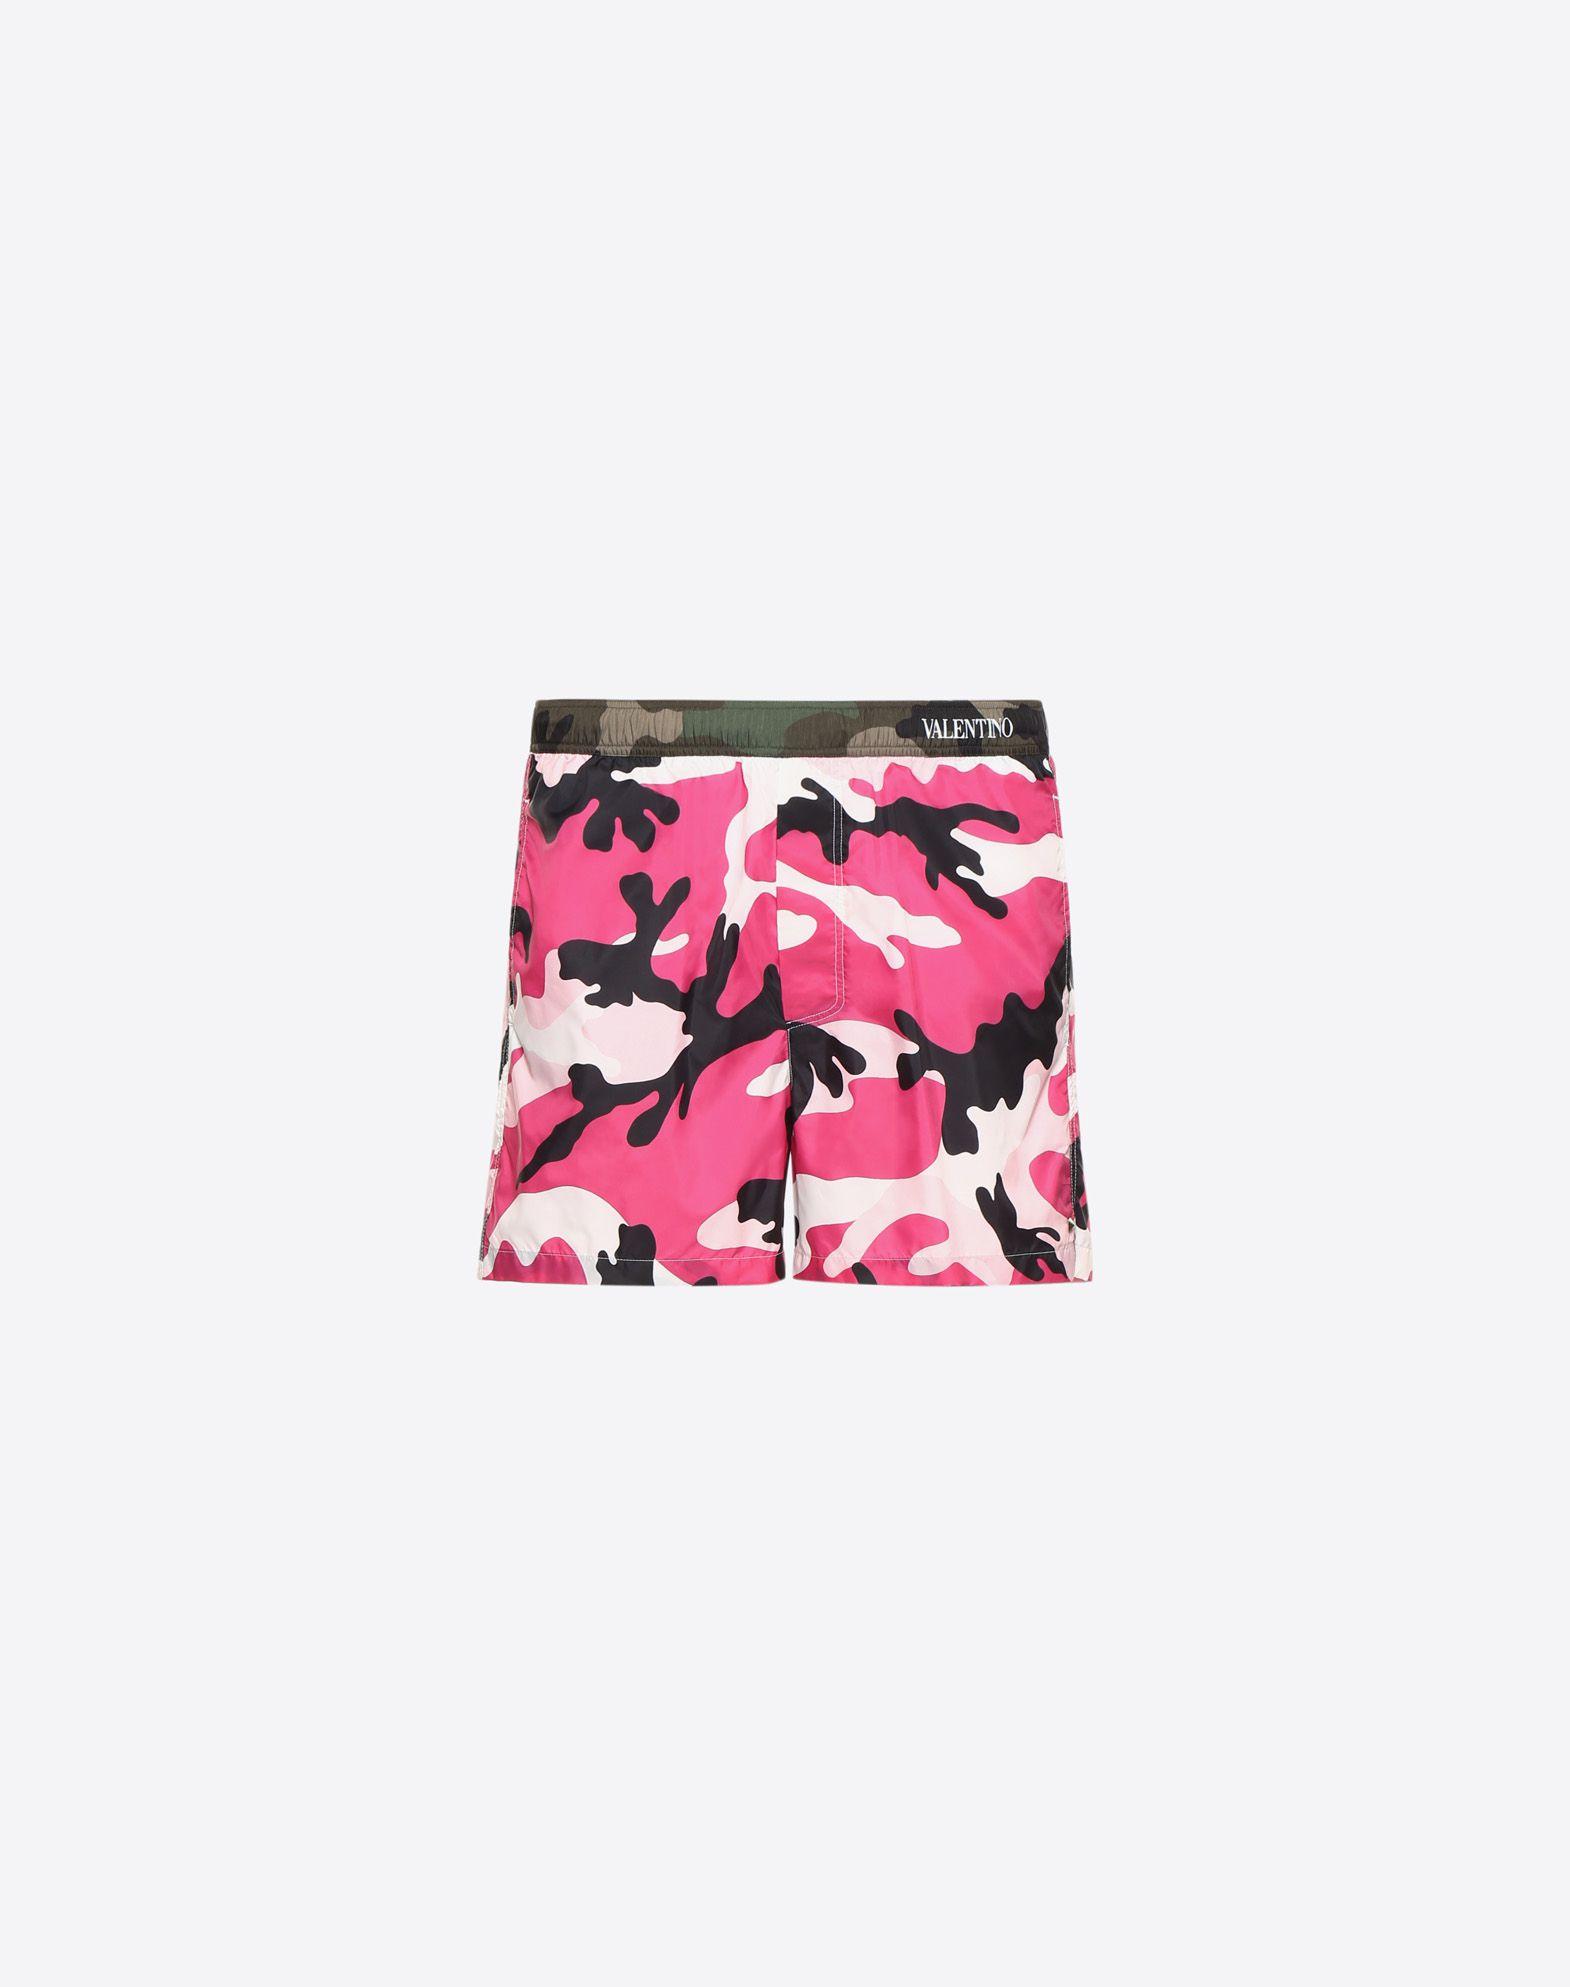 VALENTINO Logo Camouflage Drawstring closure Techno fabric Three pockets Internal slip  47224916rh